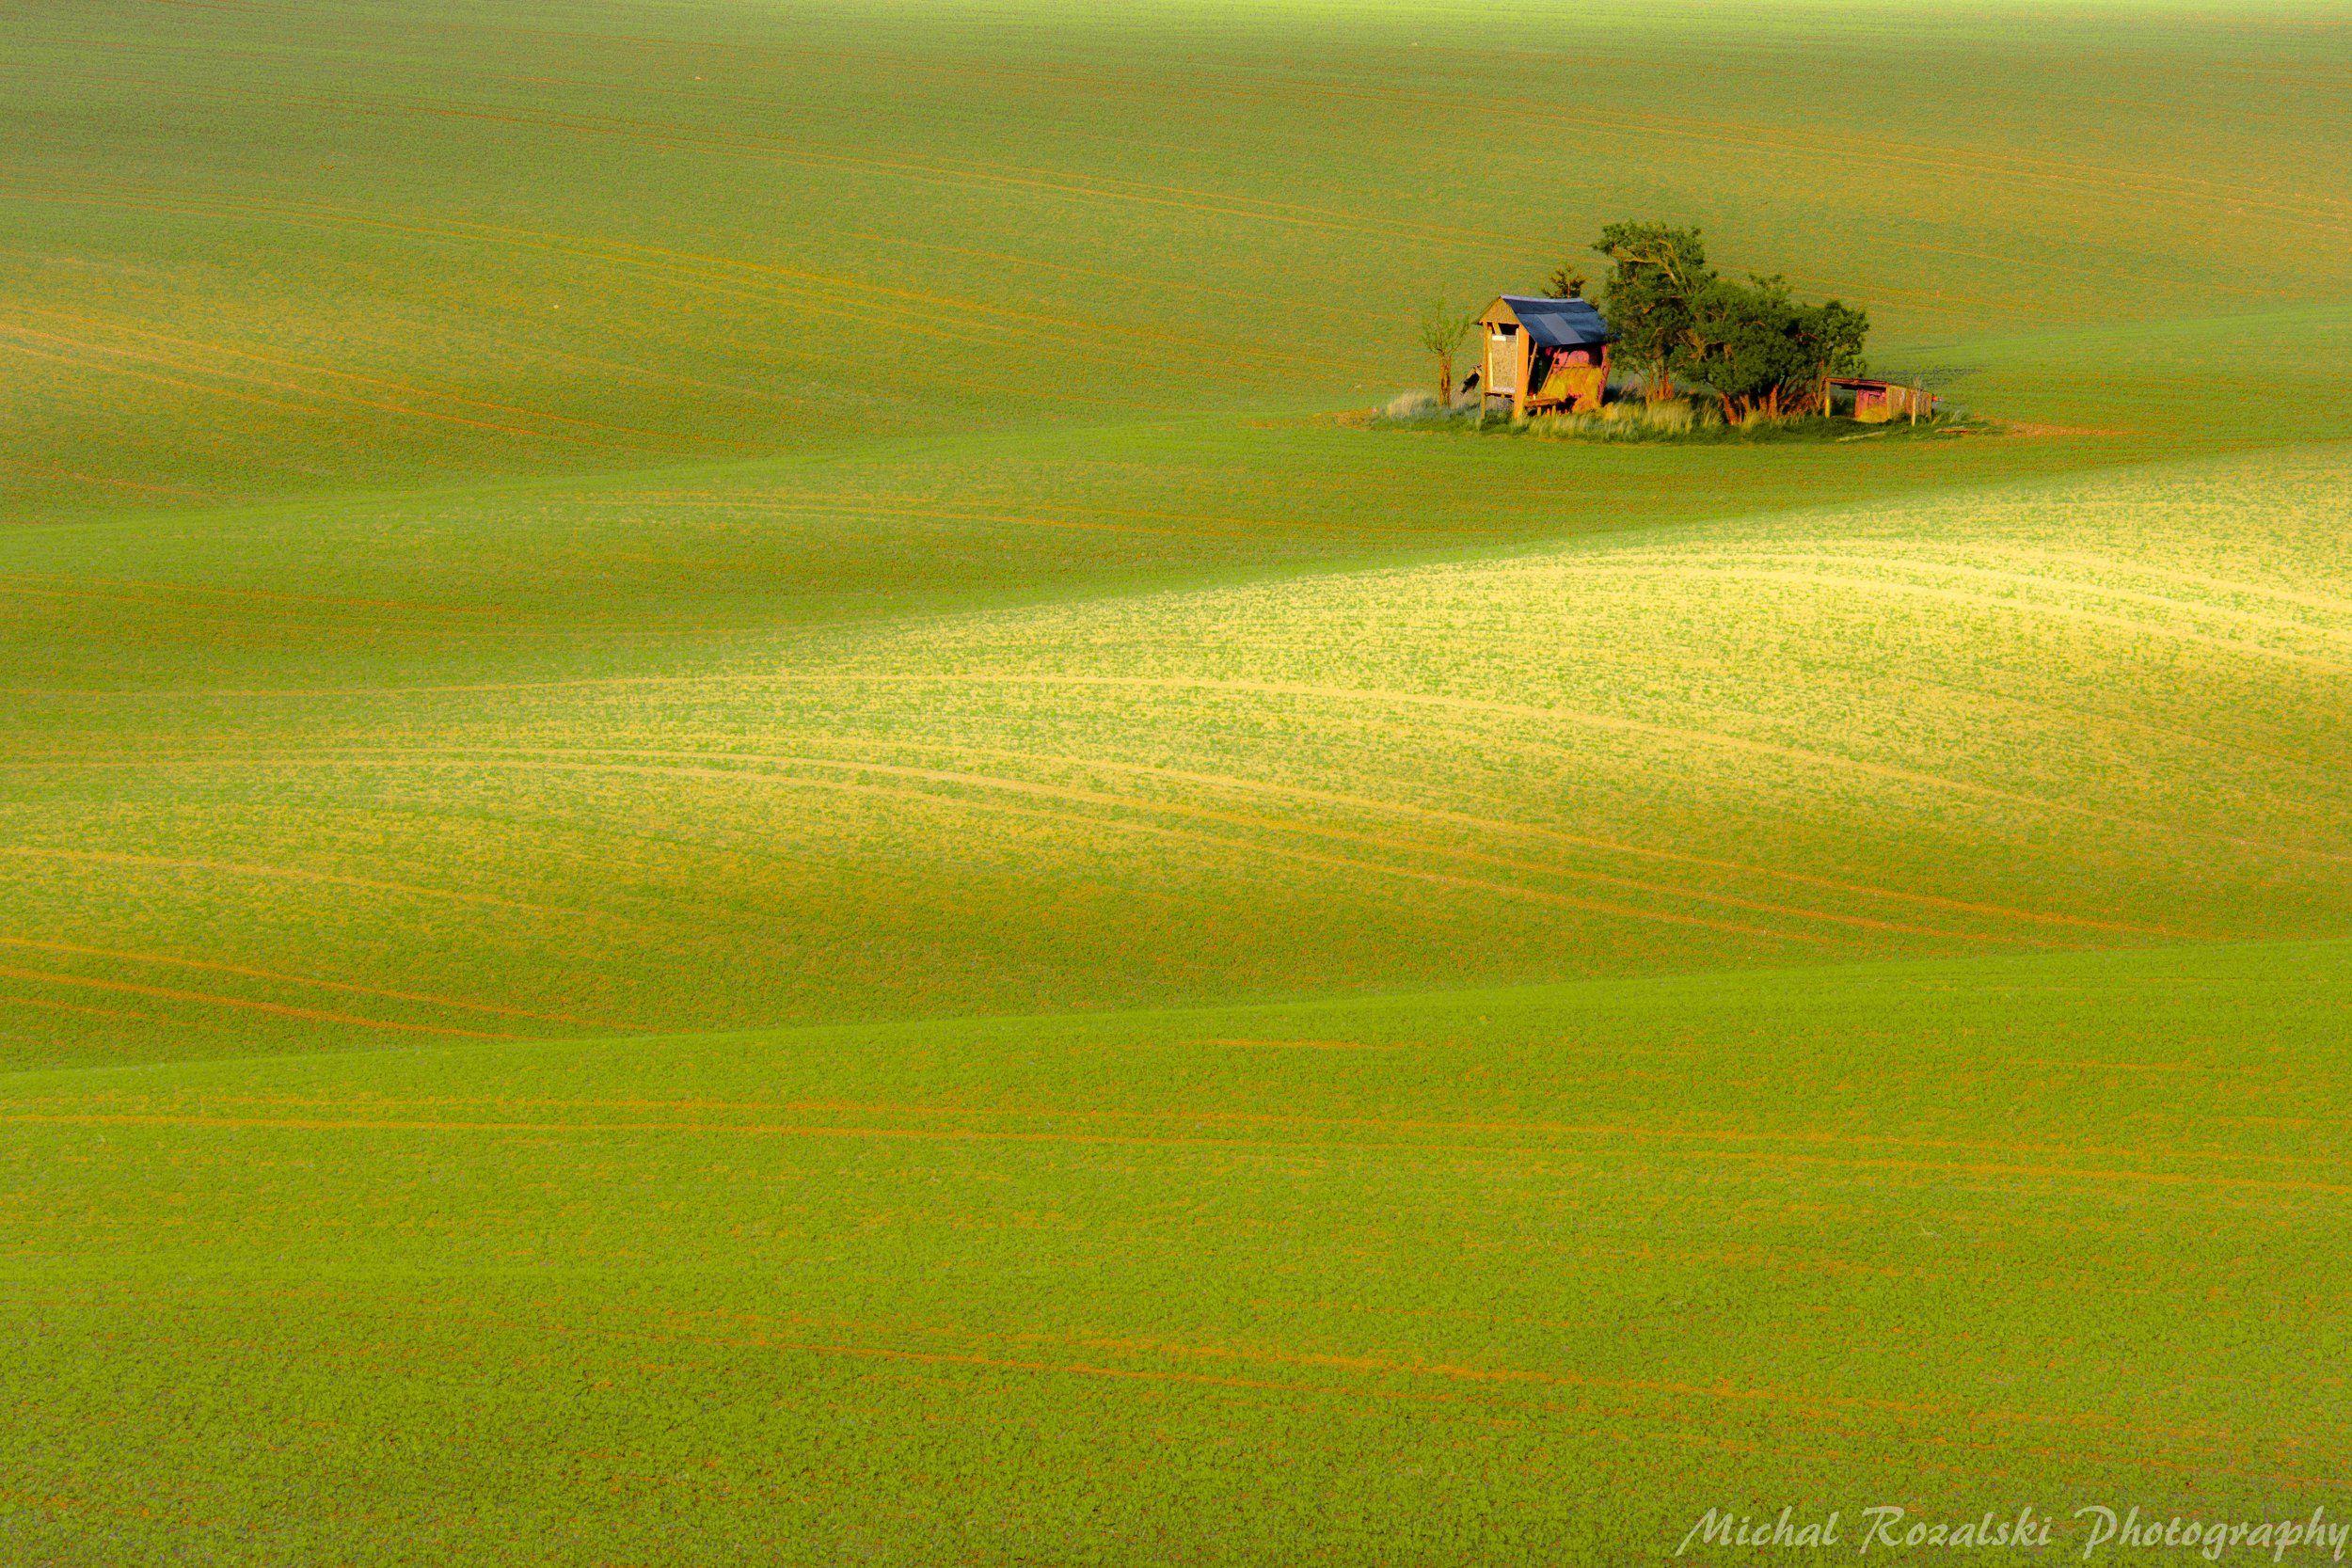 moravia, ,hills, ,rolling, ,spring, ,green, ,fields, ,agriculture, ,season, ,landscape, ,, Michal Rozalski